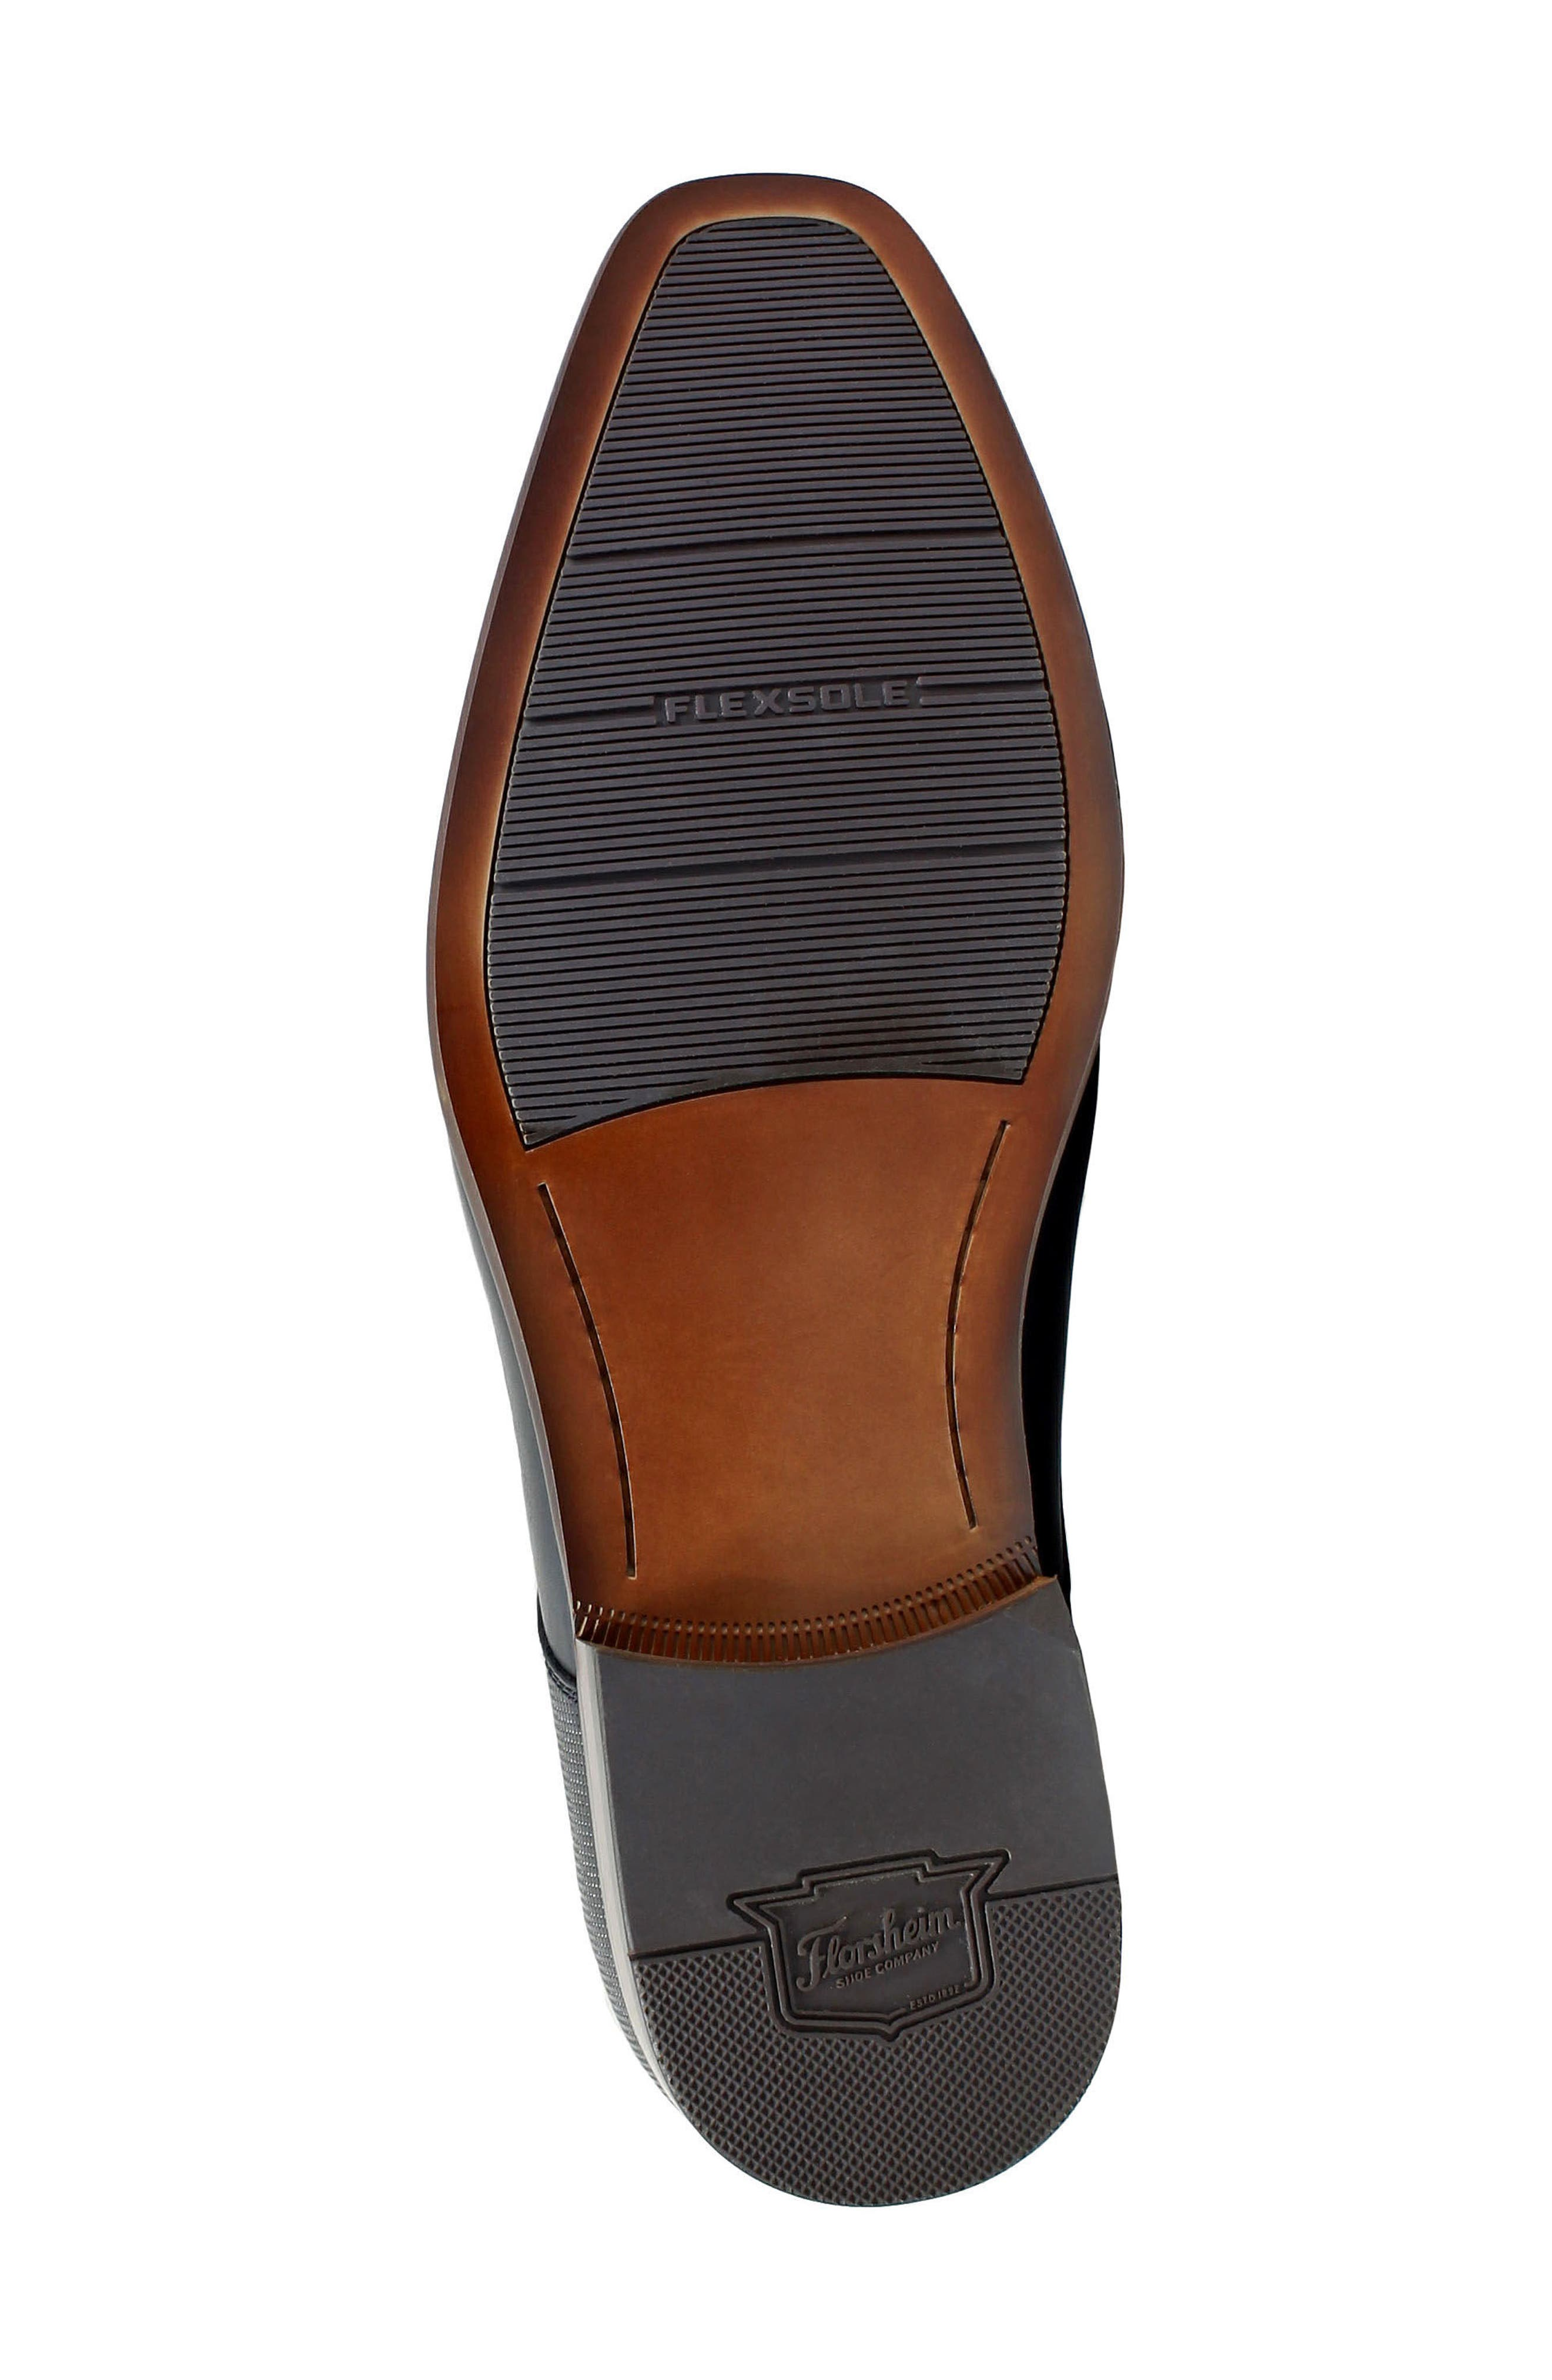 Postino Textured Double Strap Monk Shoe,                             Alternate thumbnail 6, color,                             Cognac Leather